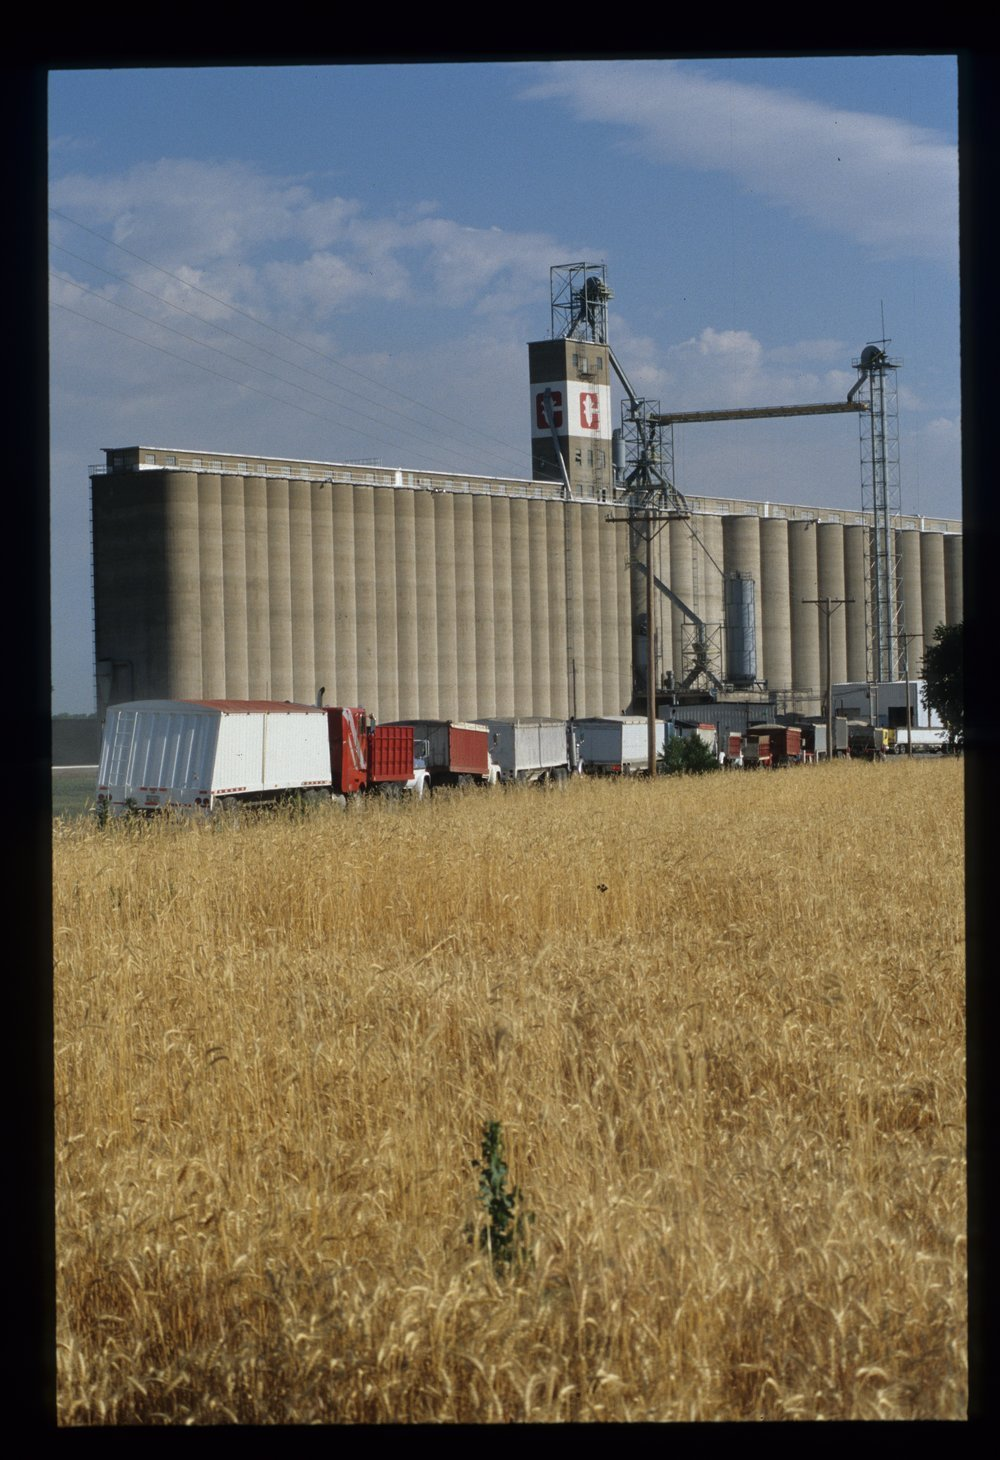 Hutchinson grain elevator, Hutchinson, Kansas - 10